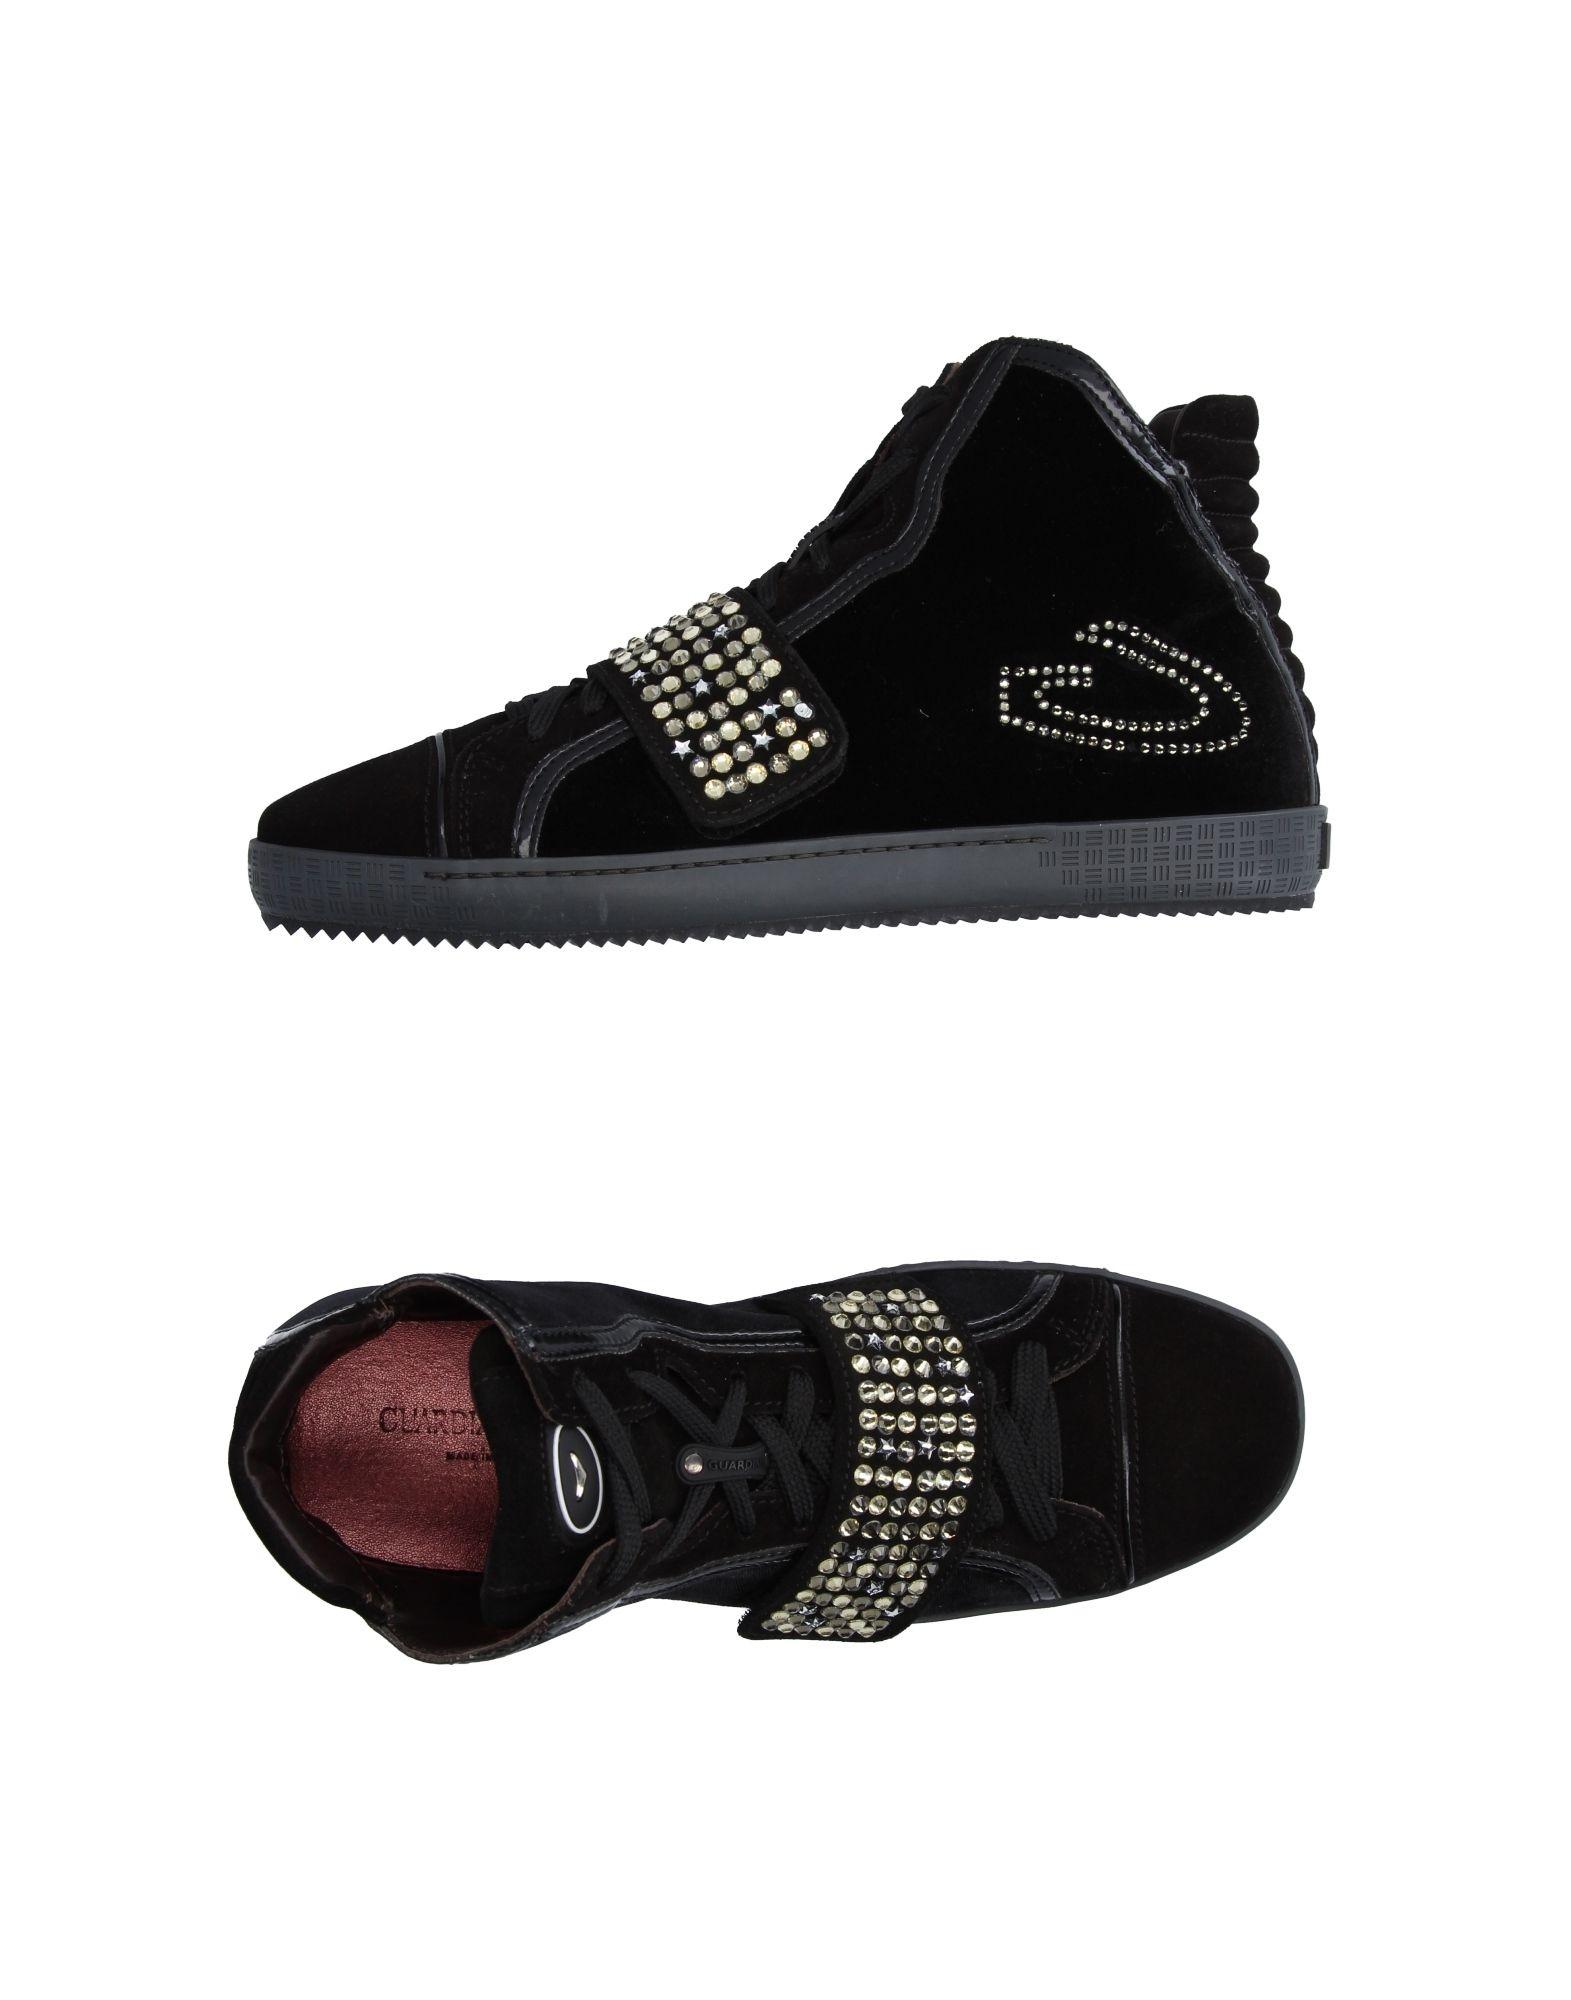 Alberto Guardiani Turnschuhes Damen Schuhe 11213314TD Gute Qualität beliebte Schuhe Damen 0a934c